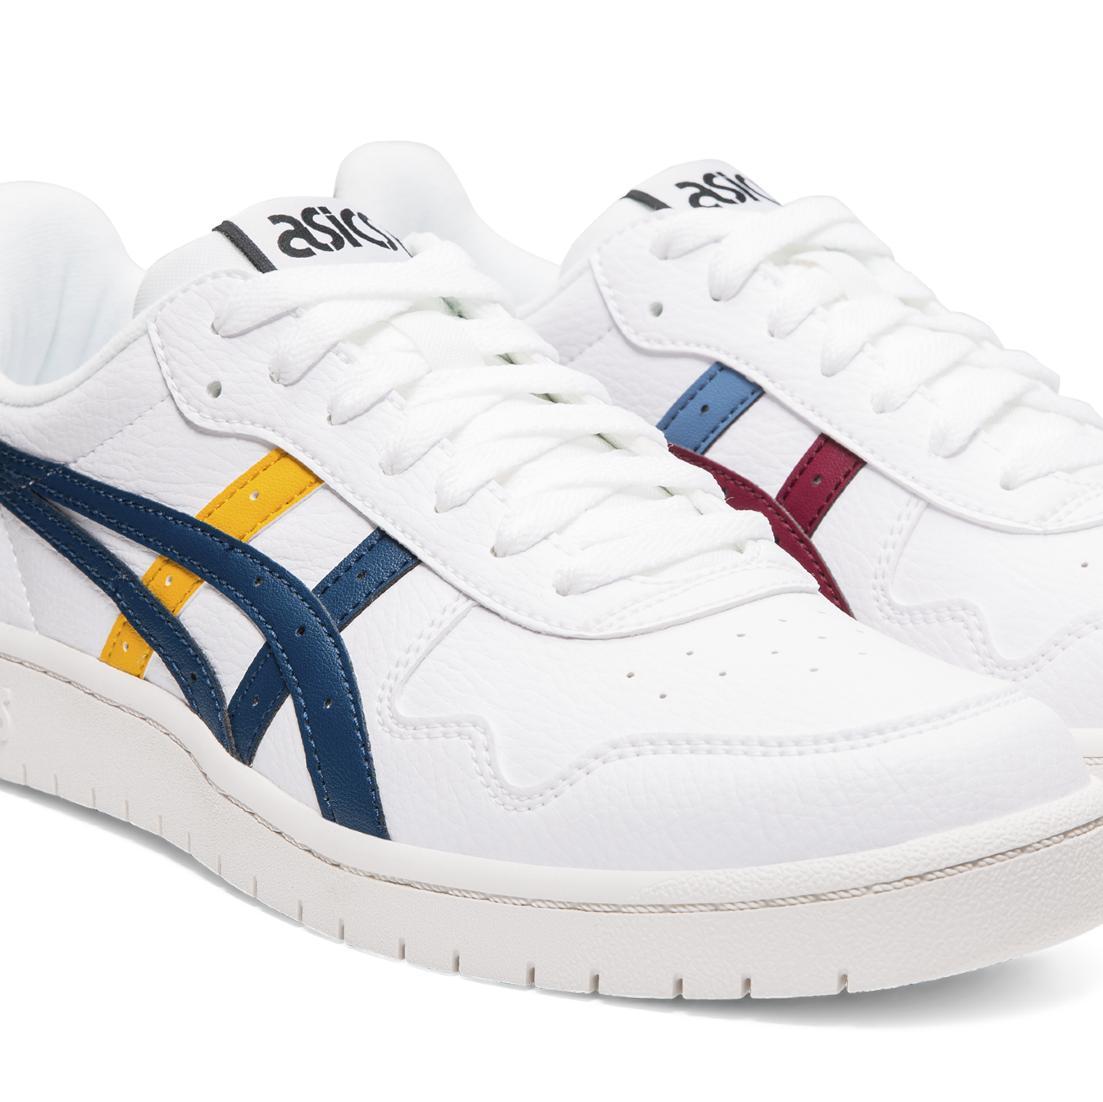 Asics Tiger Japan S Sneaker